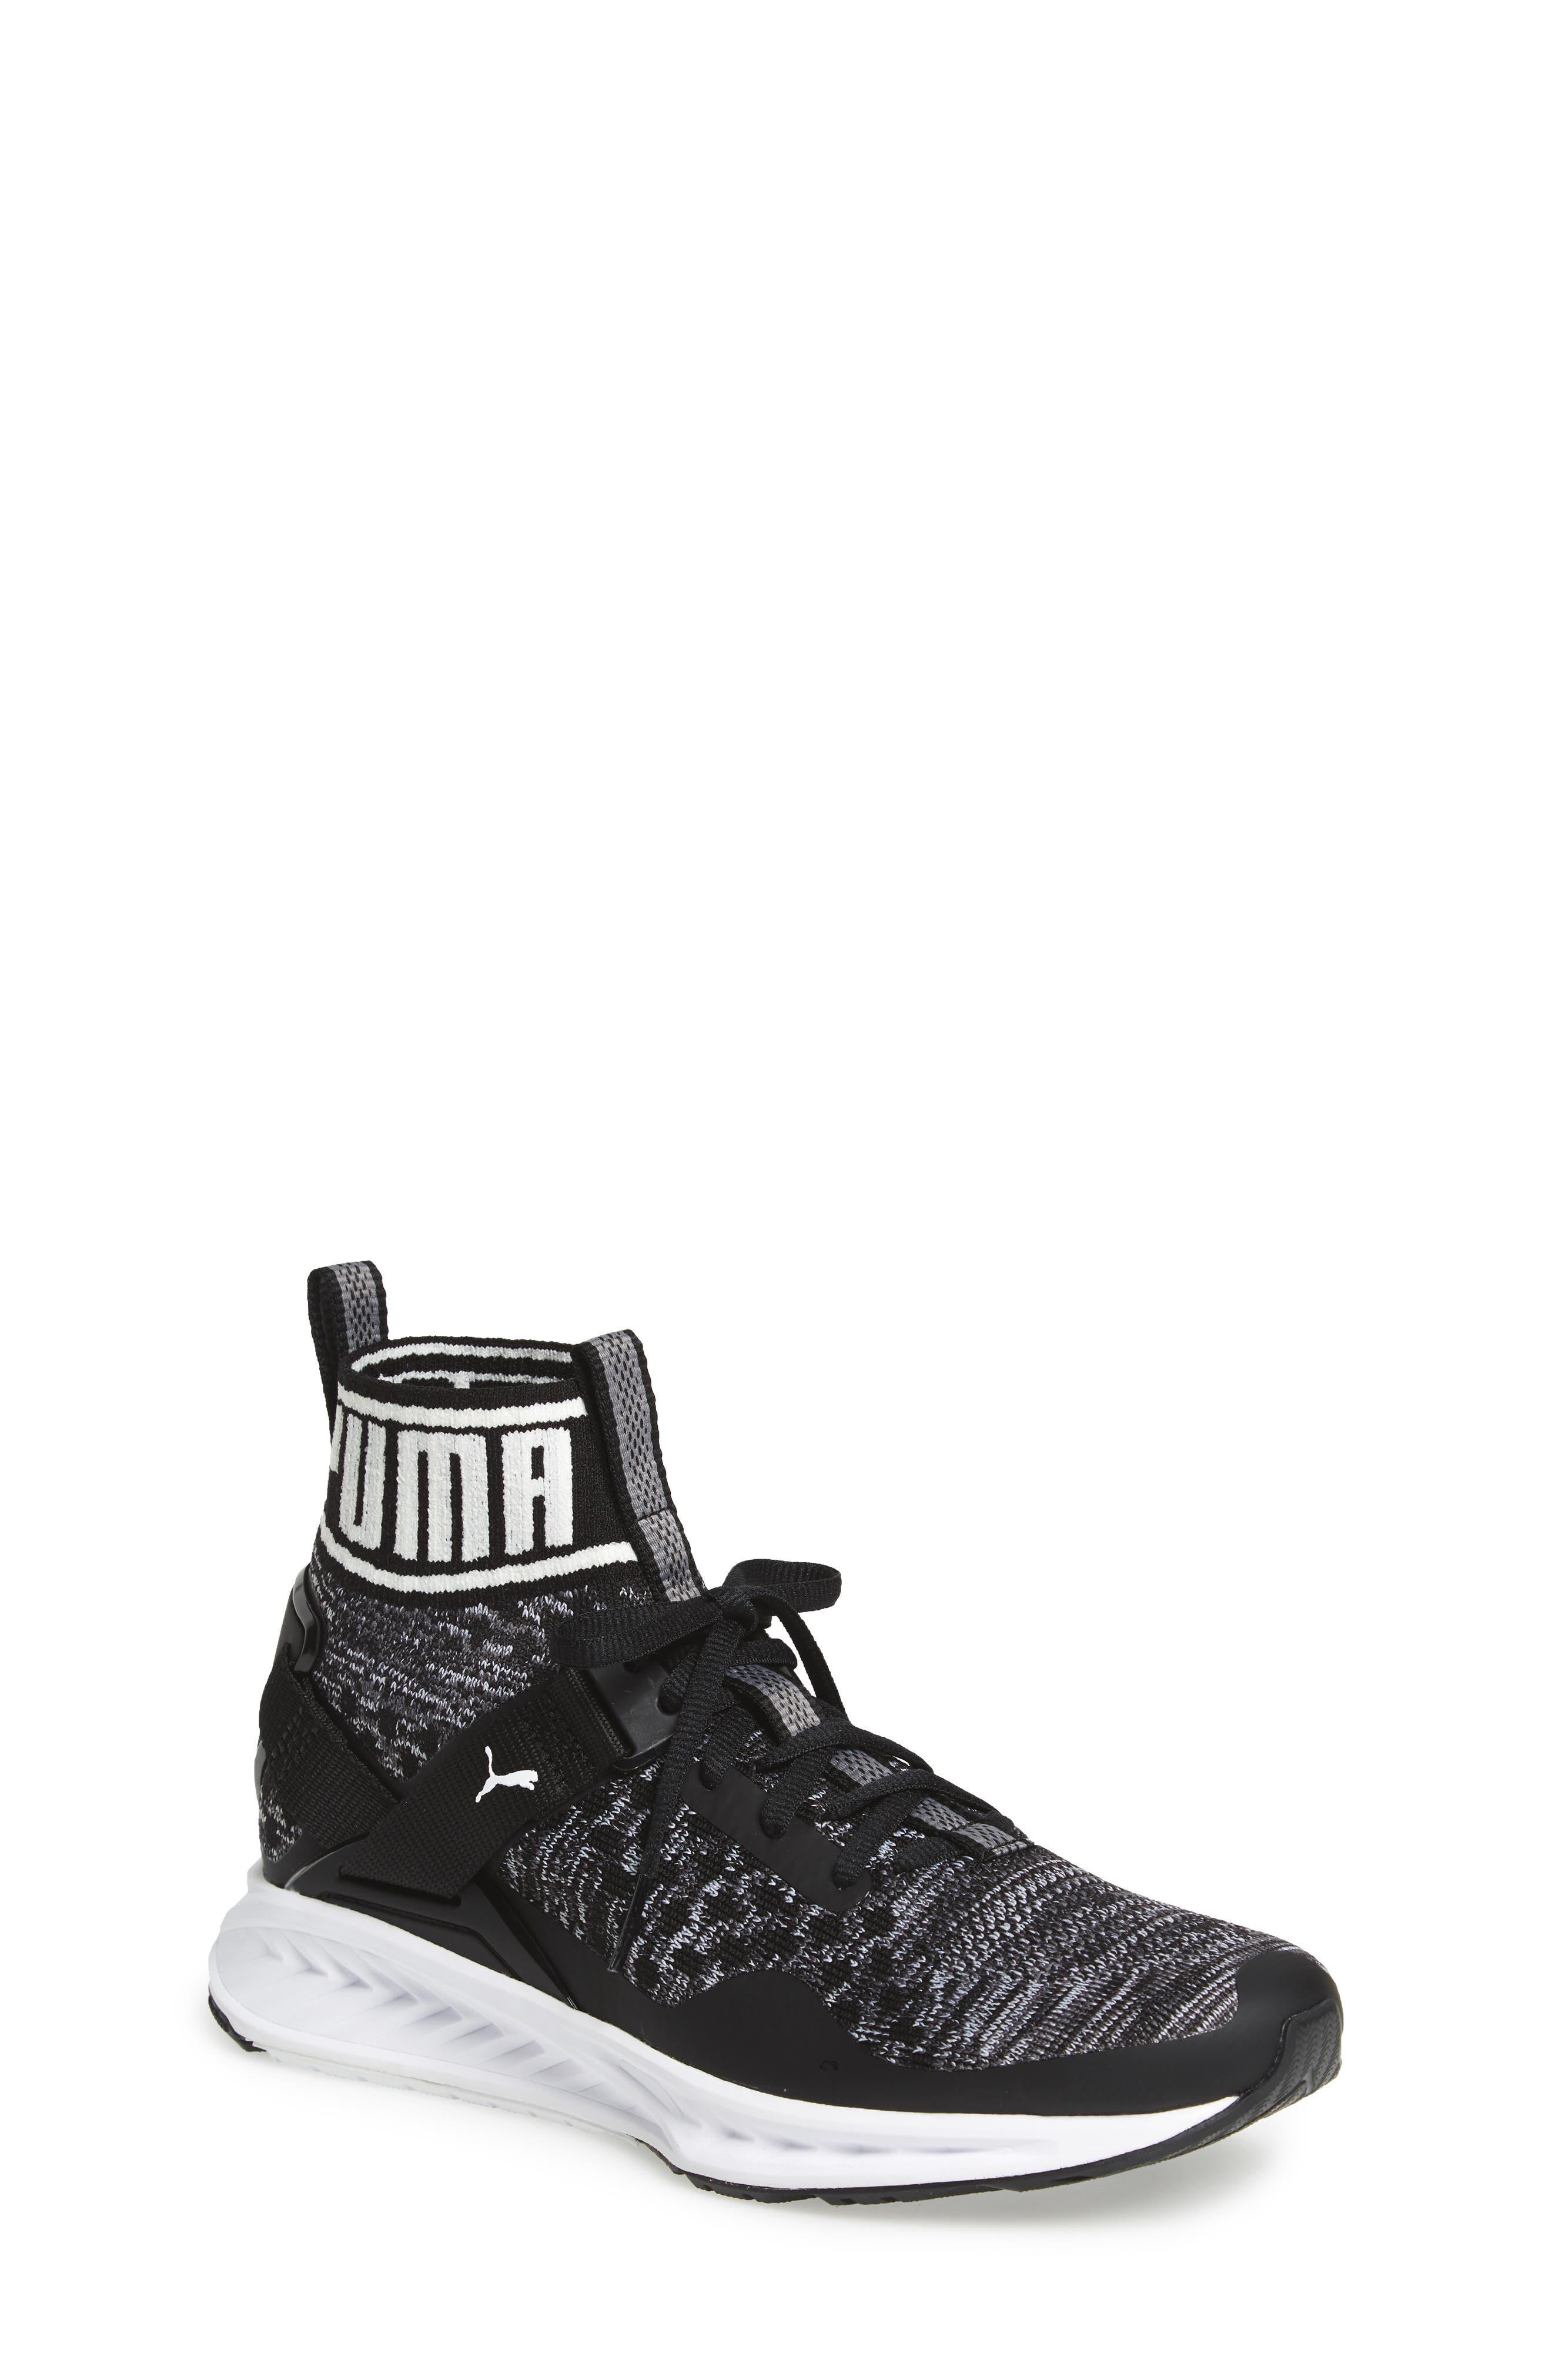 PUMA Ignite Evoknit Sneaker